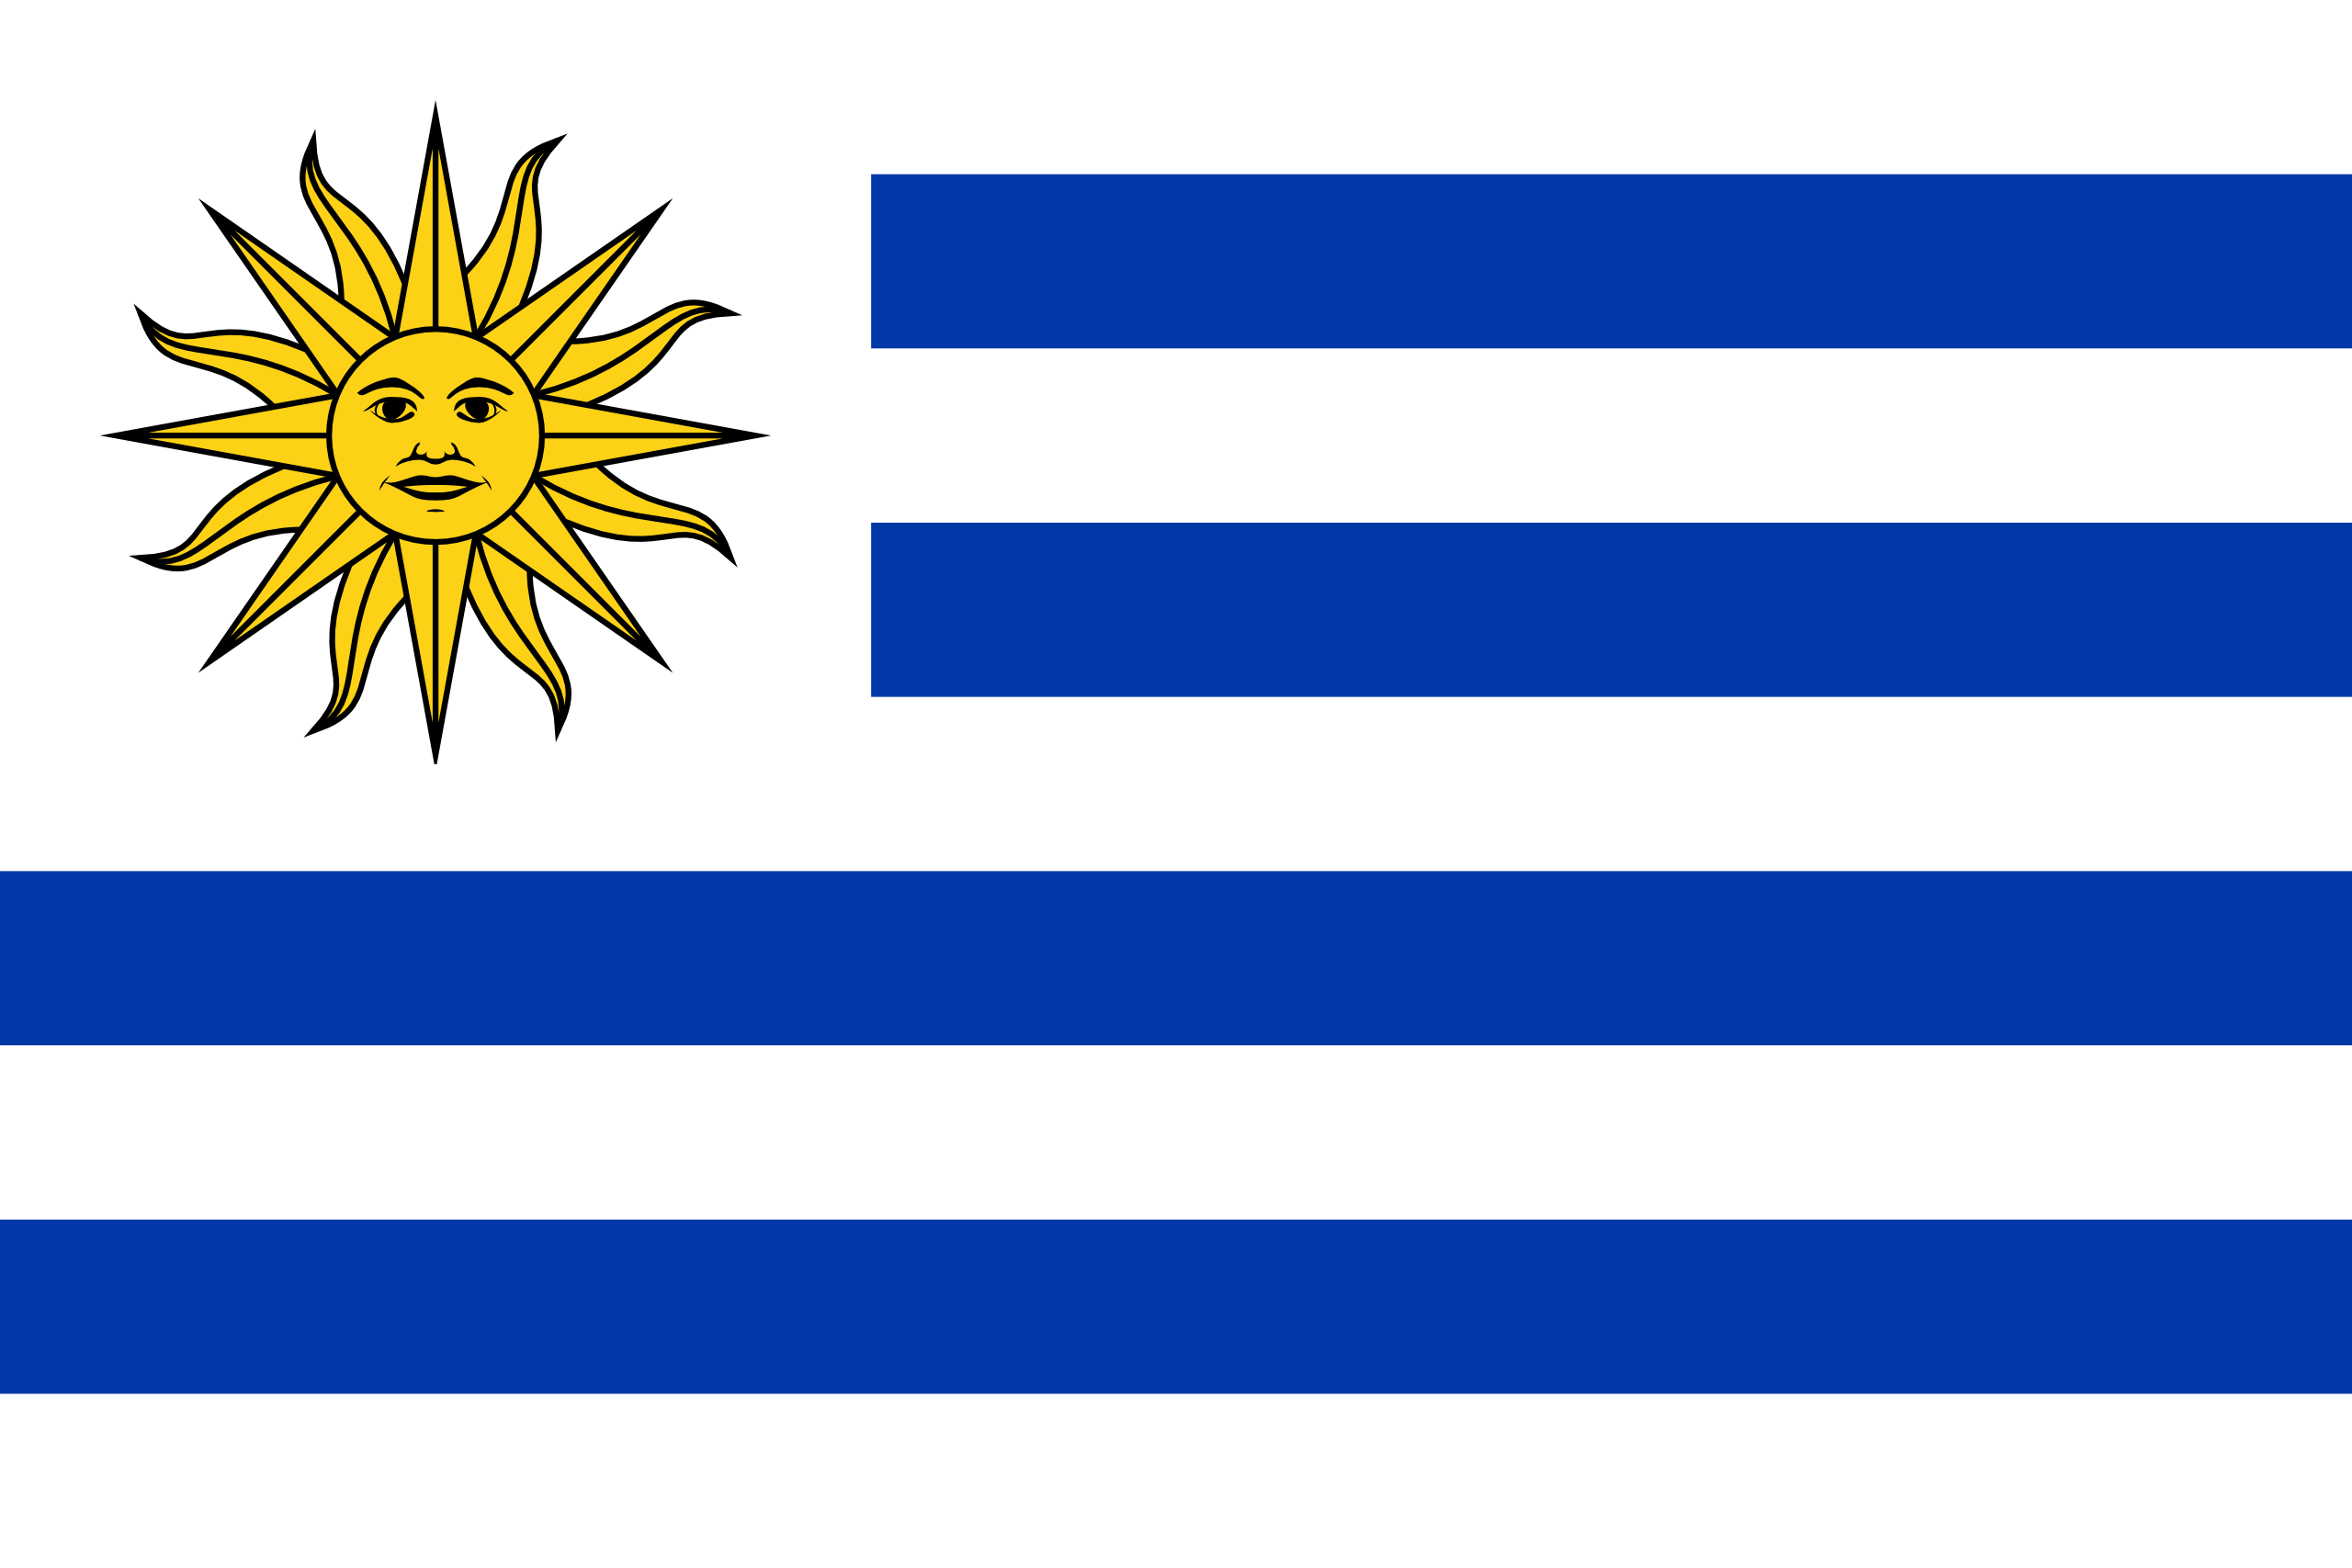 Uruguay, paese, emblema, logo, simbolo - Sfondi HD - Professor-falken.com